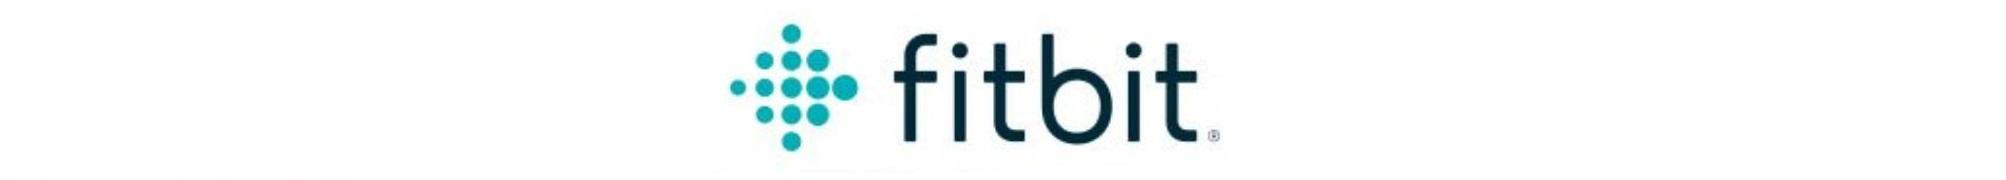 fitbit1.jpg